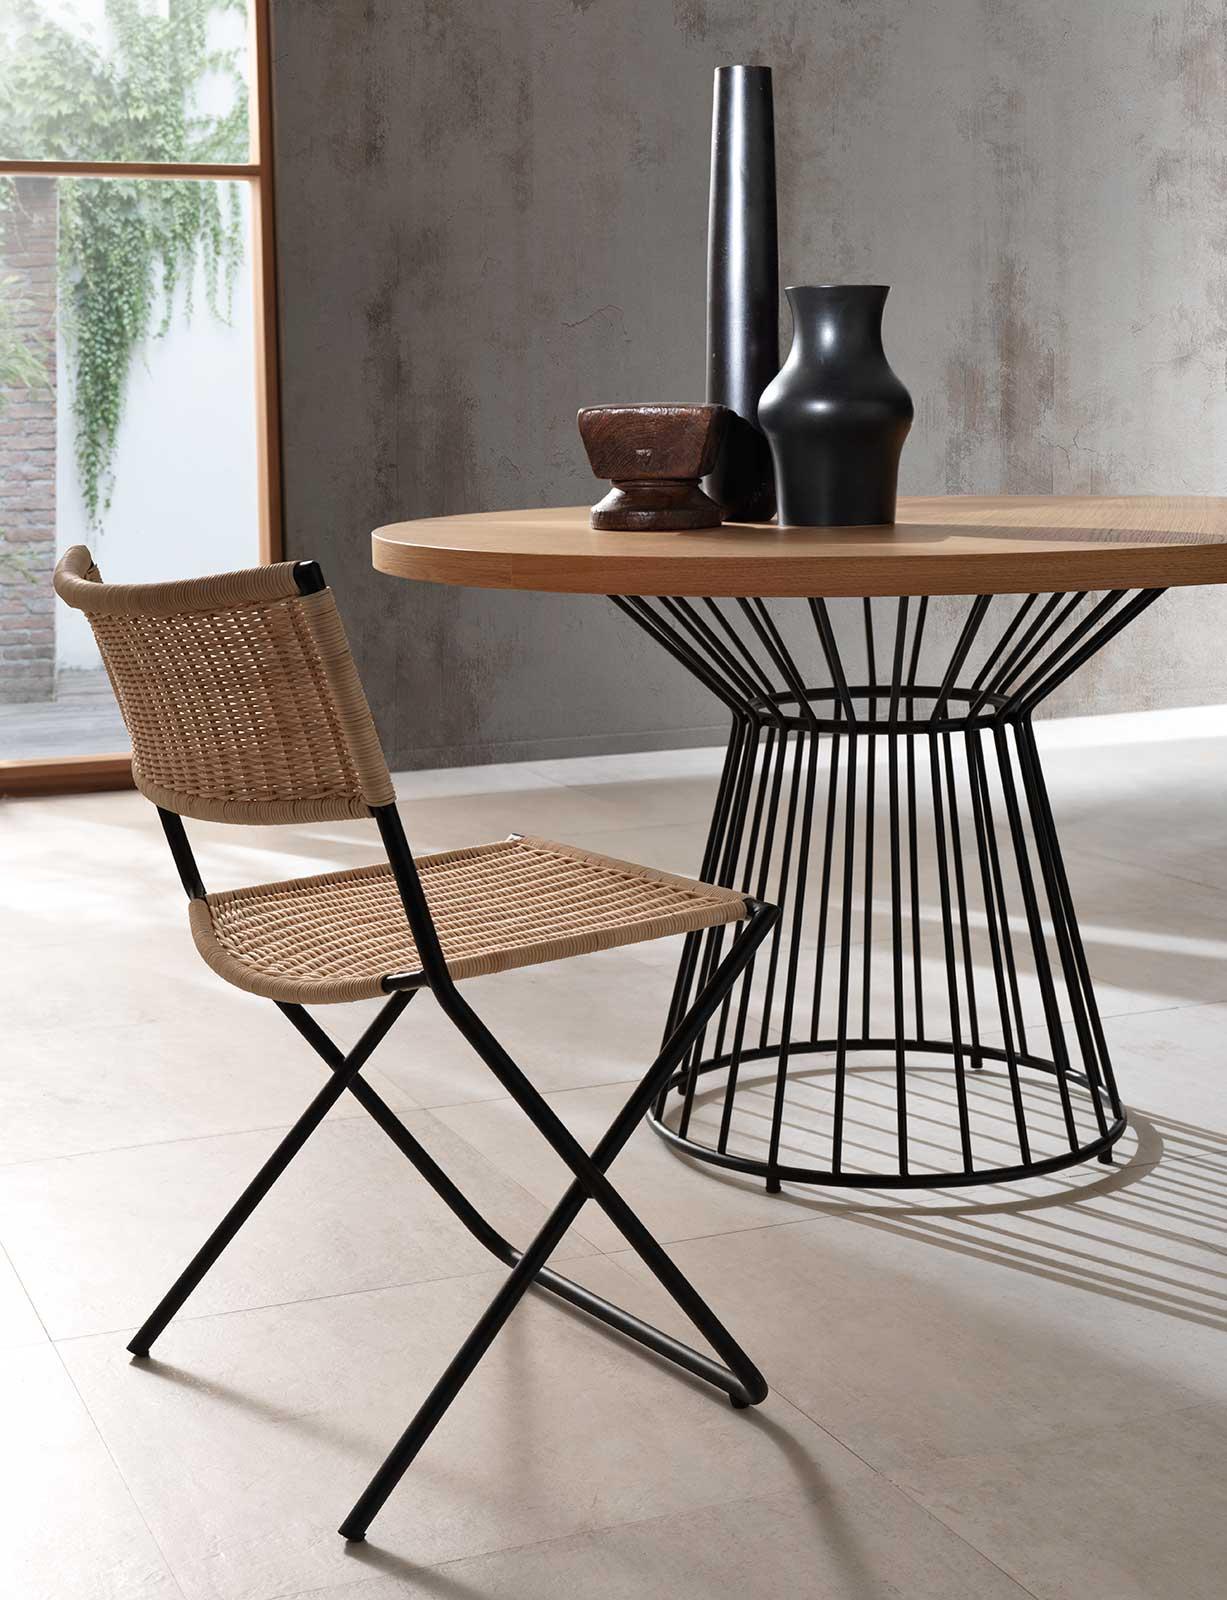 Susan-sedia-poltroncina-ferro-midollino